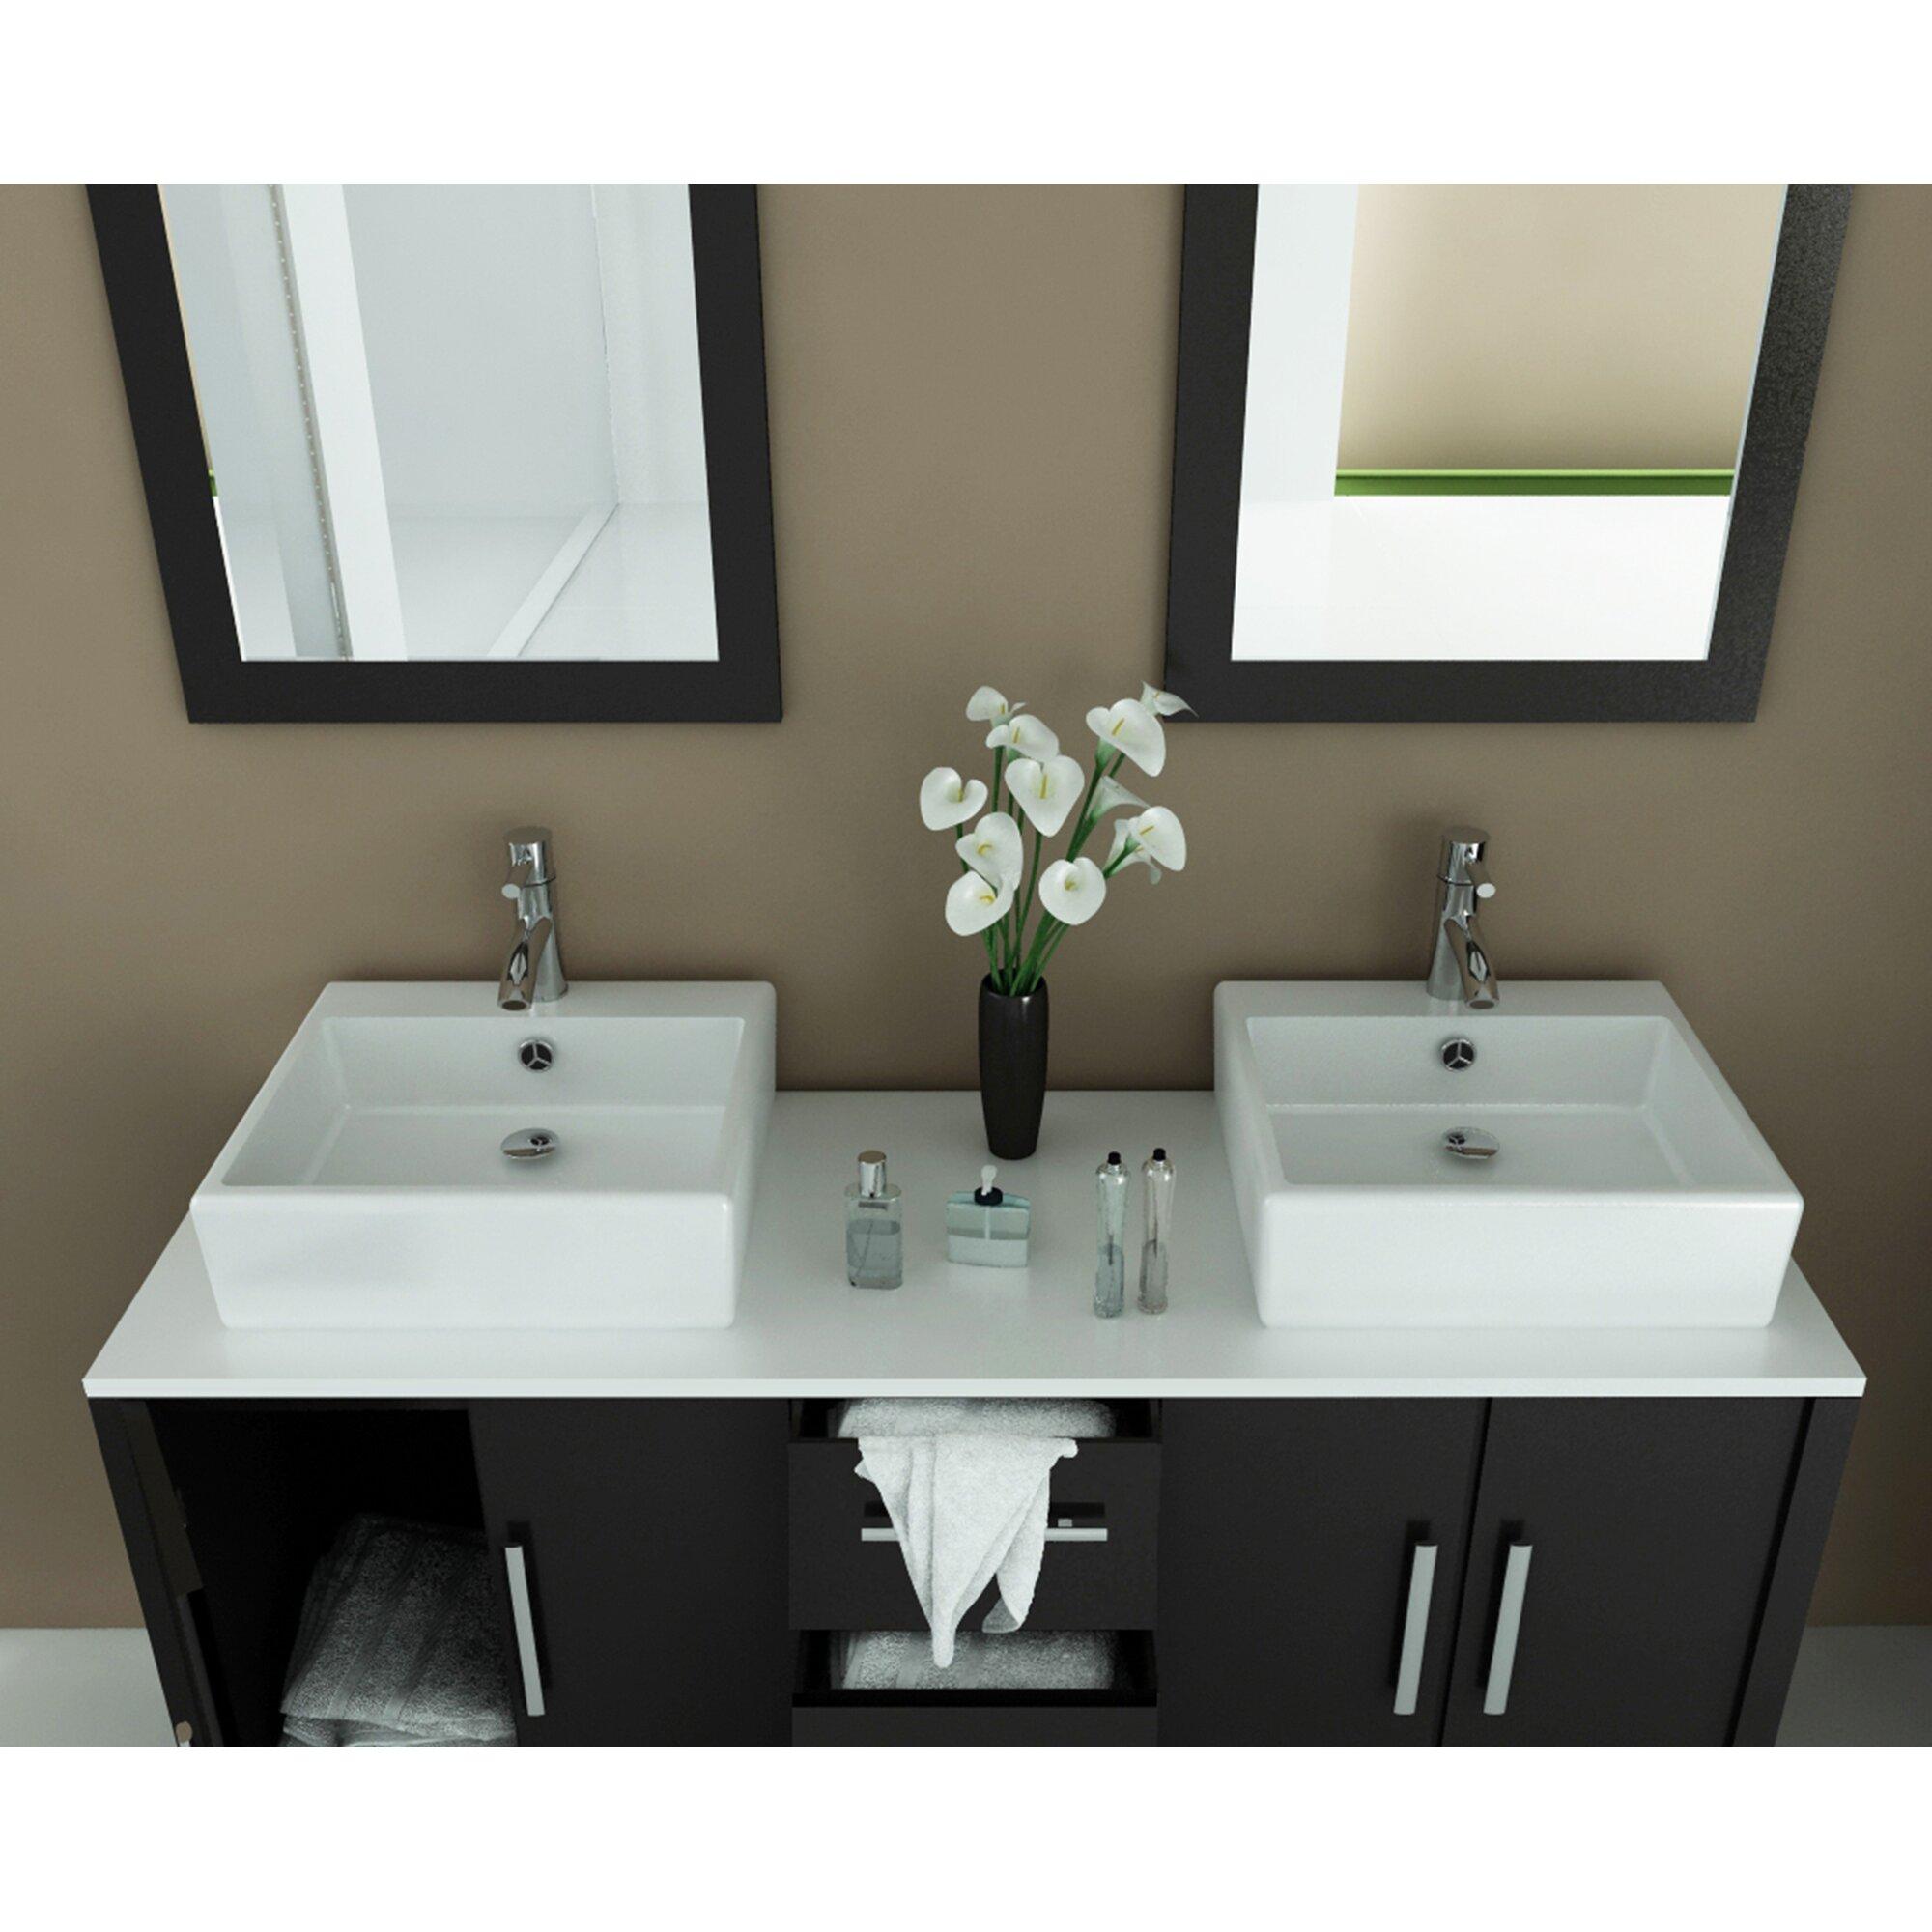 Double Bathroom Sinks And Washing Machine Through 2 Inch Drain